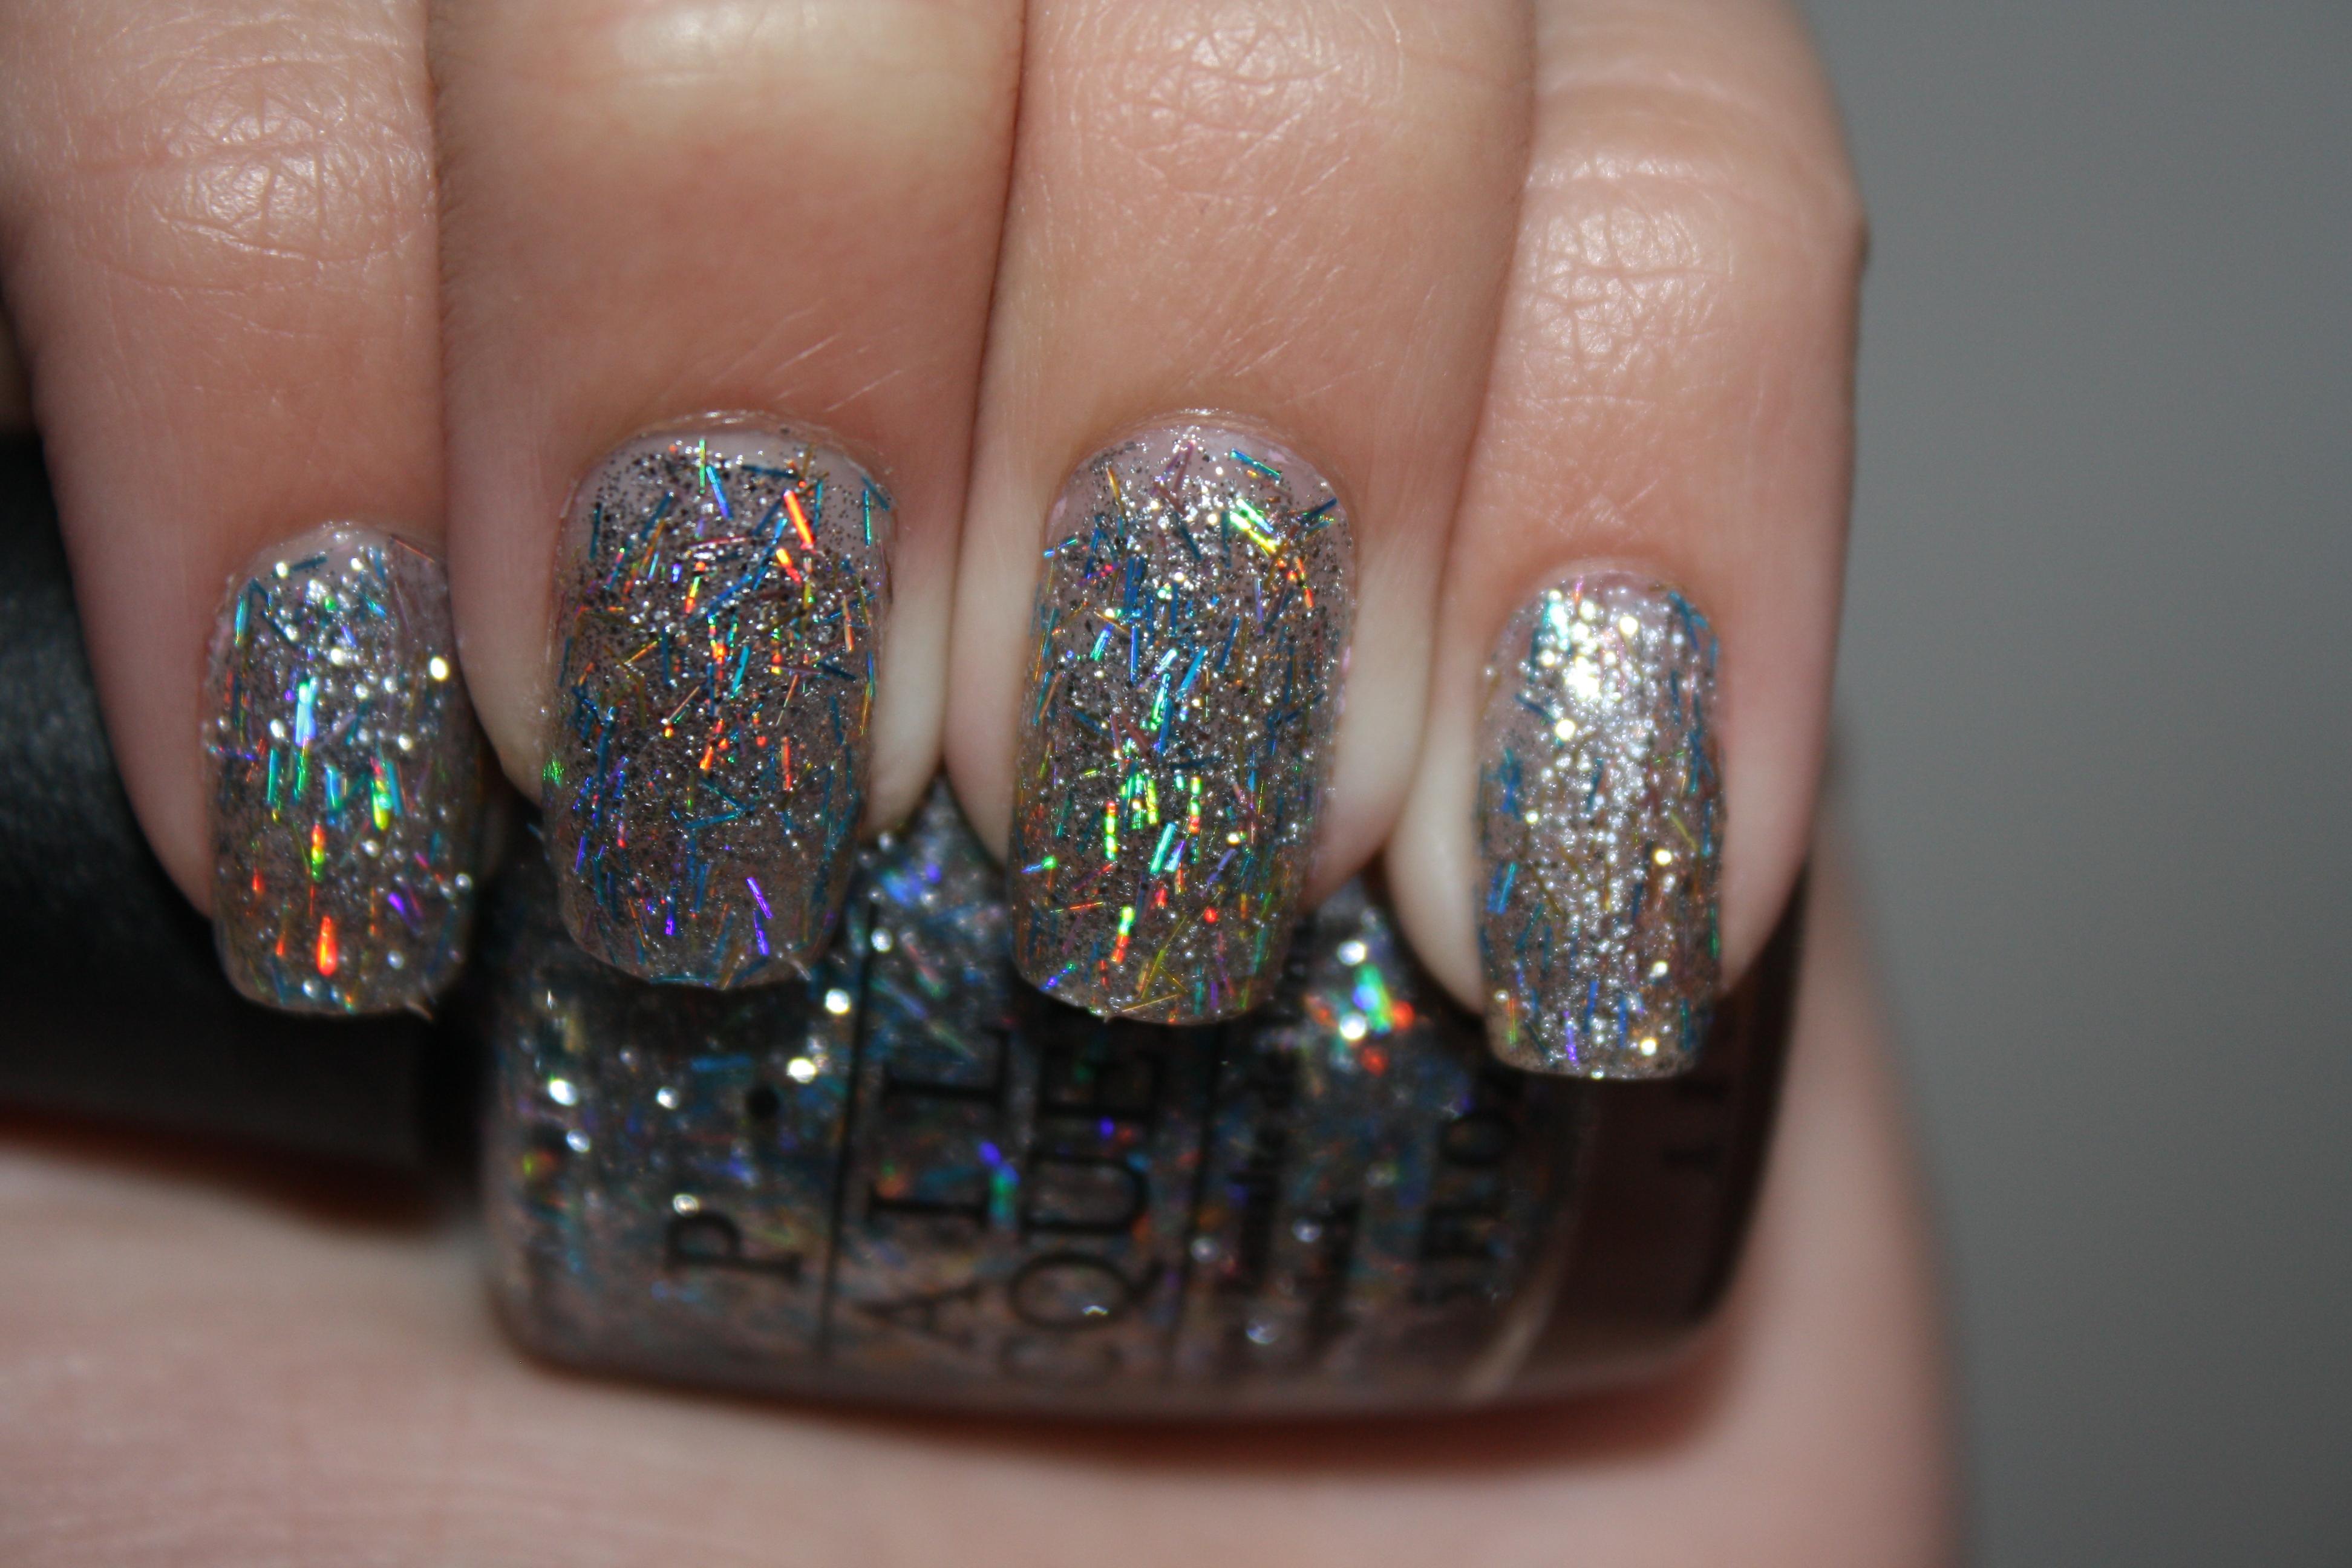 Nicki Minaj by OPI Save Me Nail Polish Review, Swatches, and Photos ...